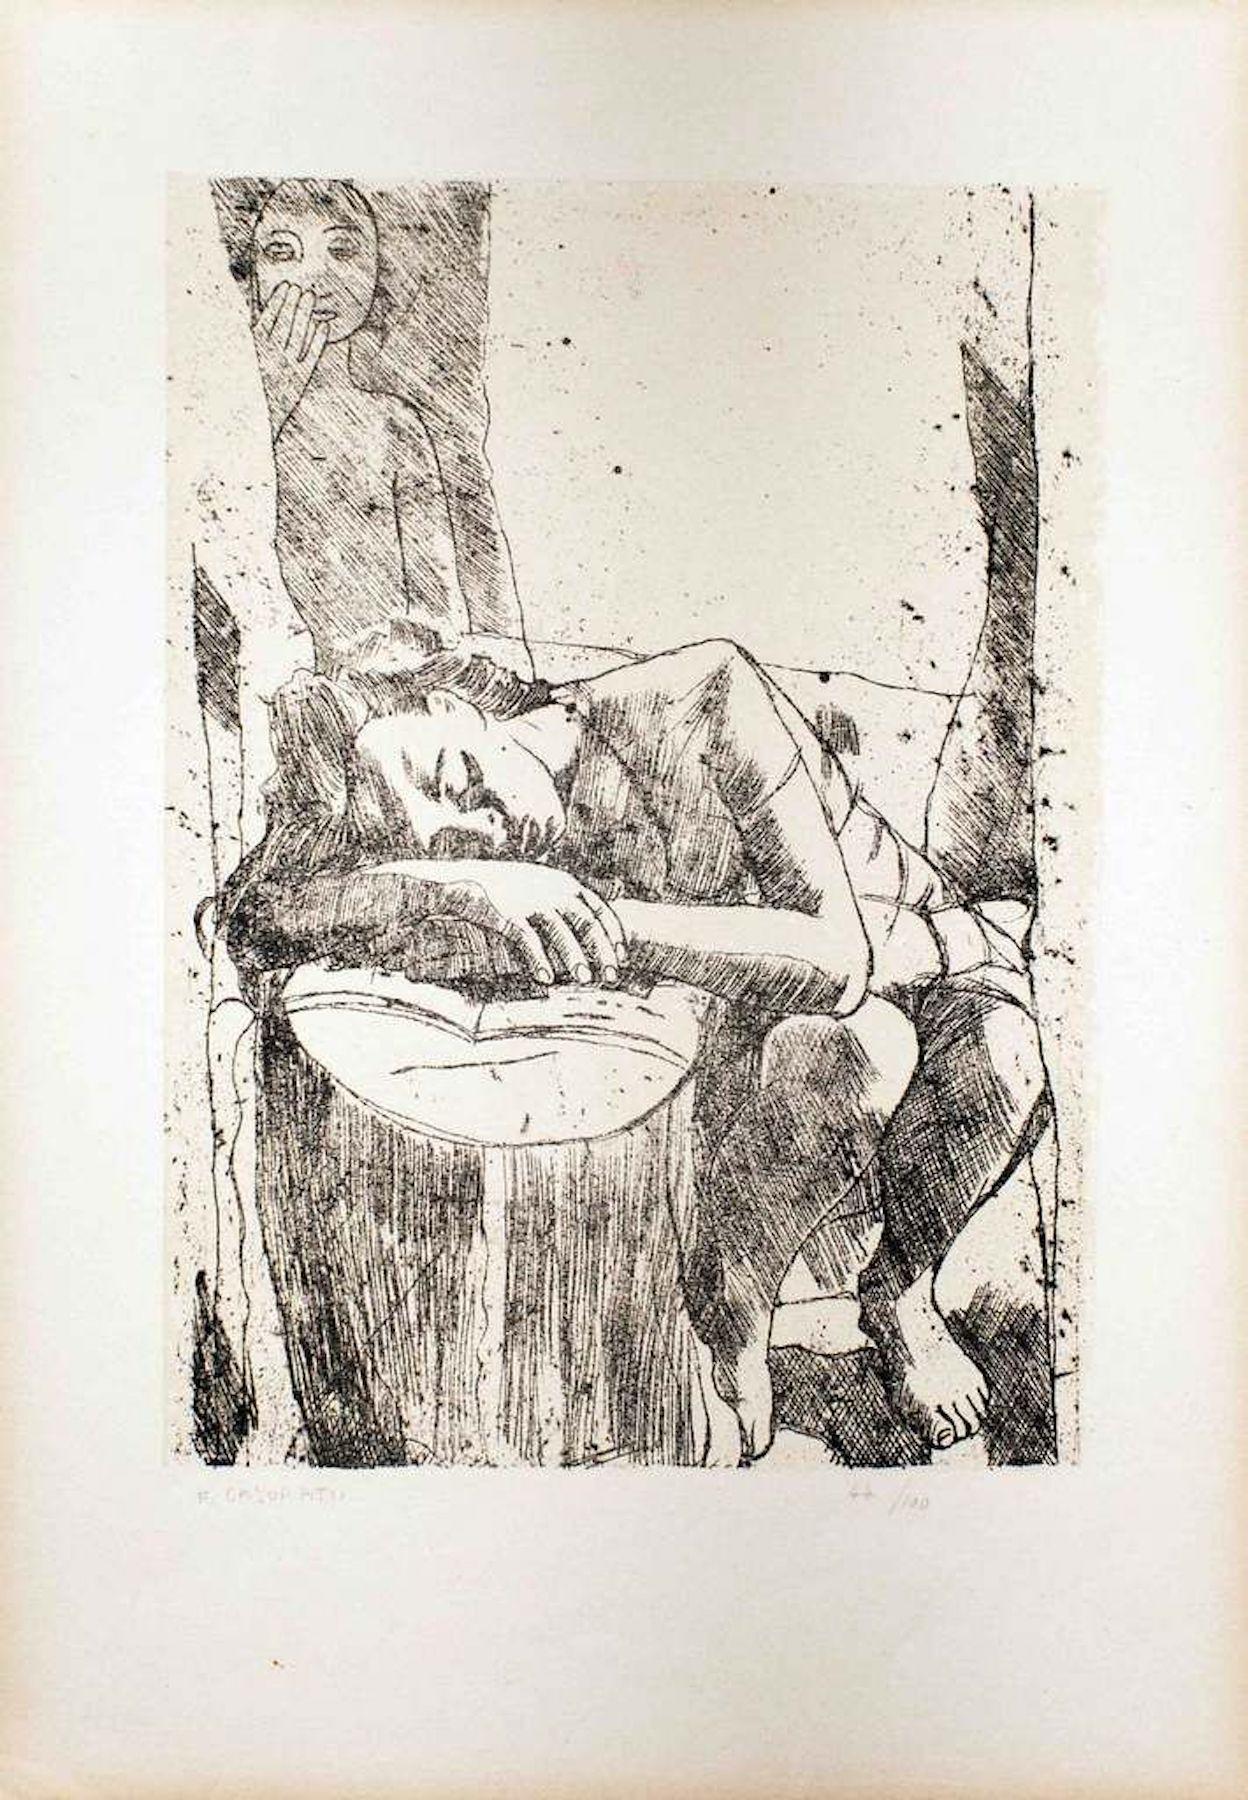 Sleeping Woman - Original Lithograph by Felice Casorati - 1946